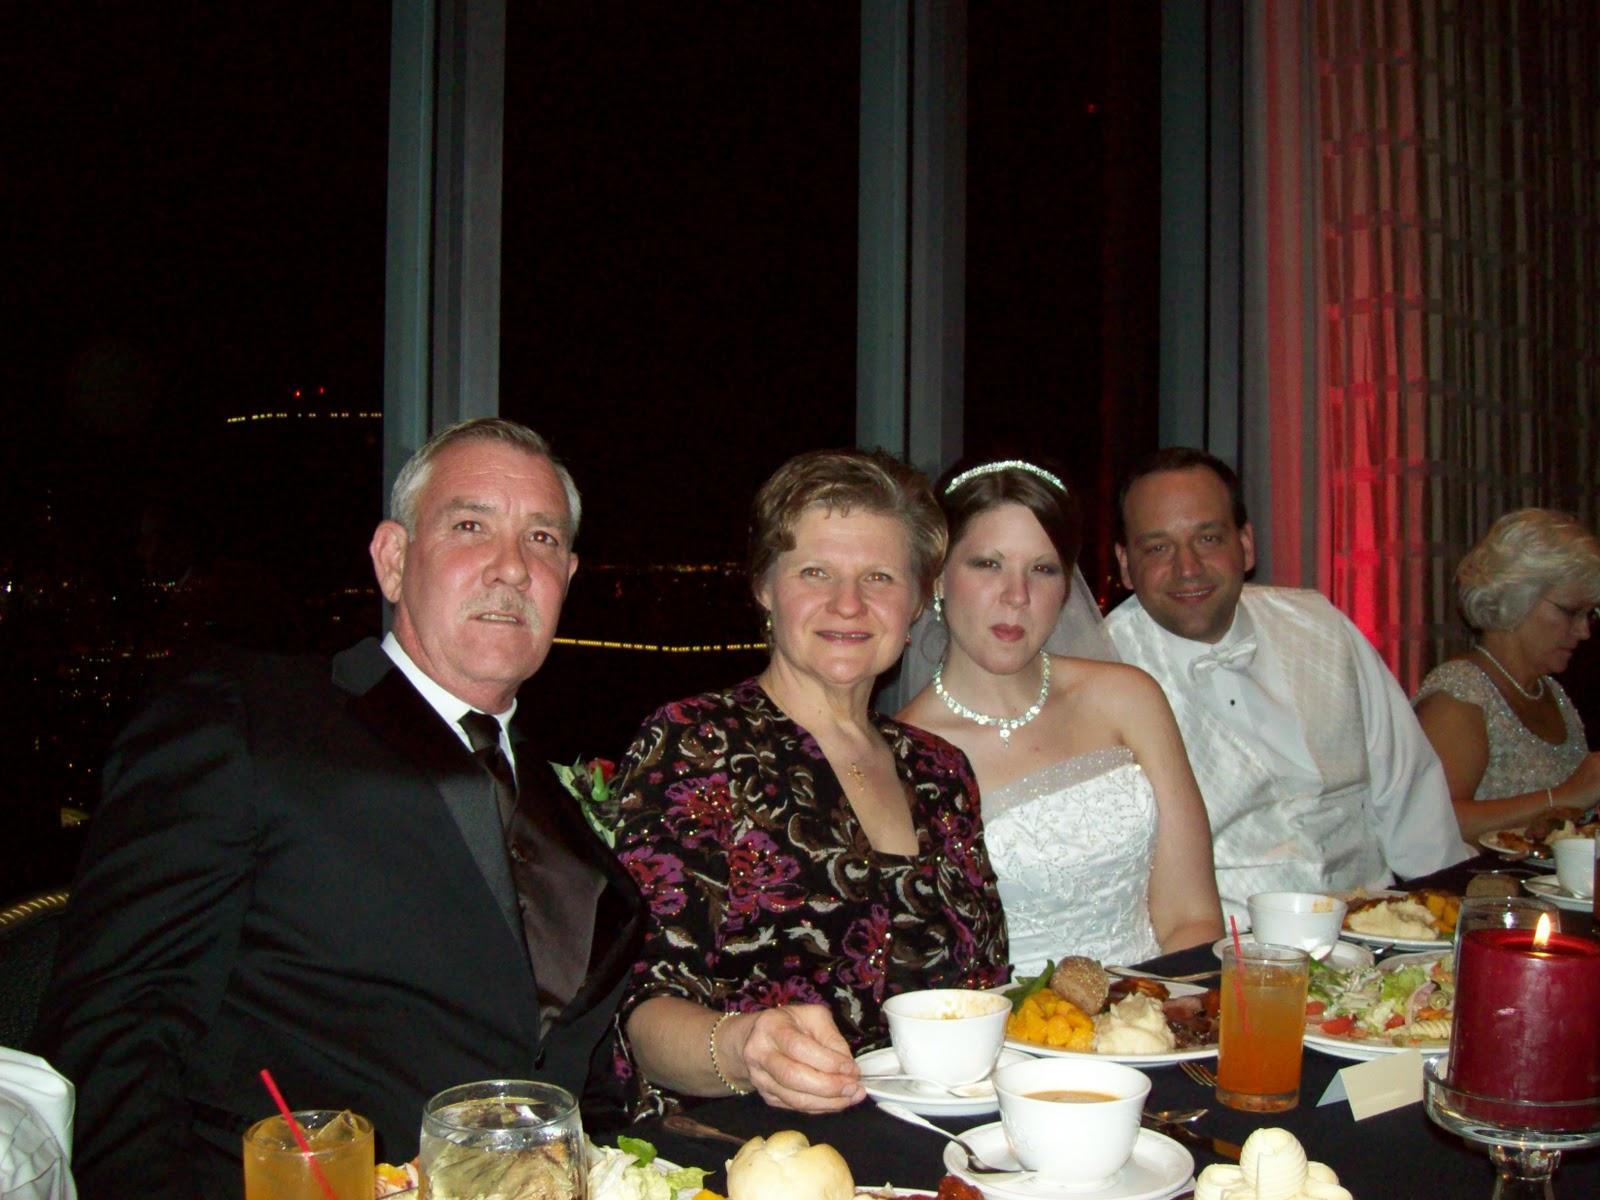 Virginias Wedding - 101_5923.JPG